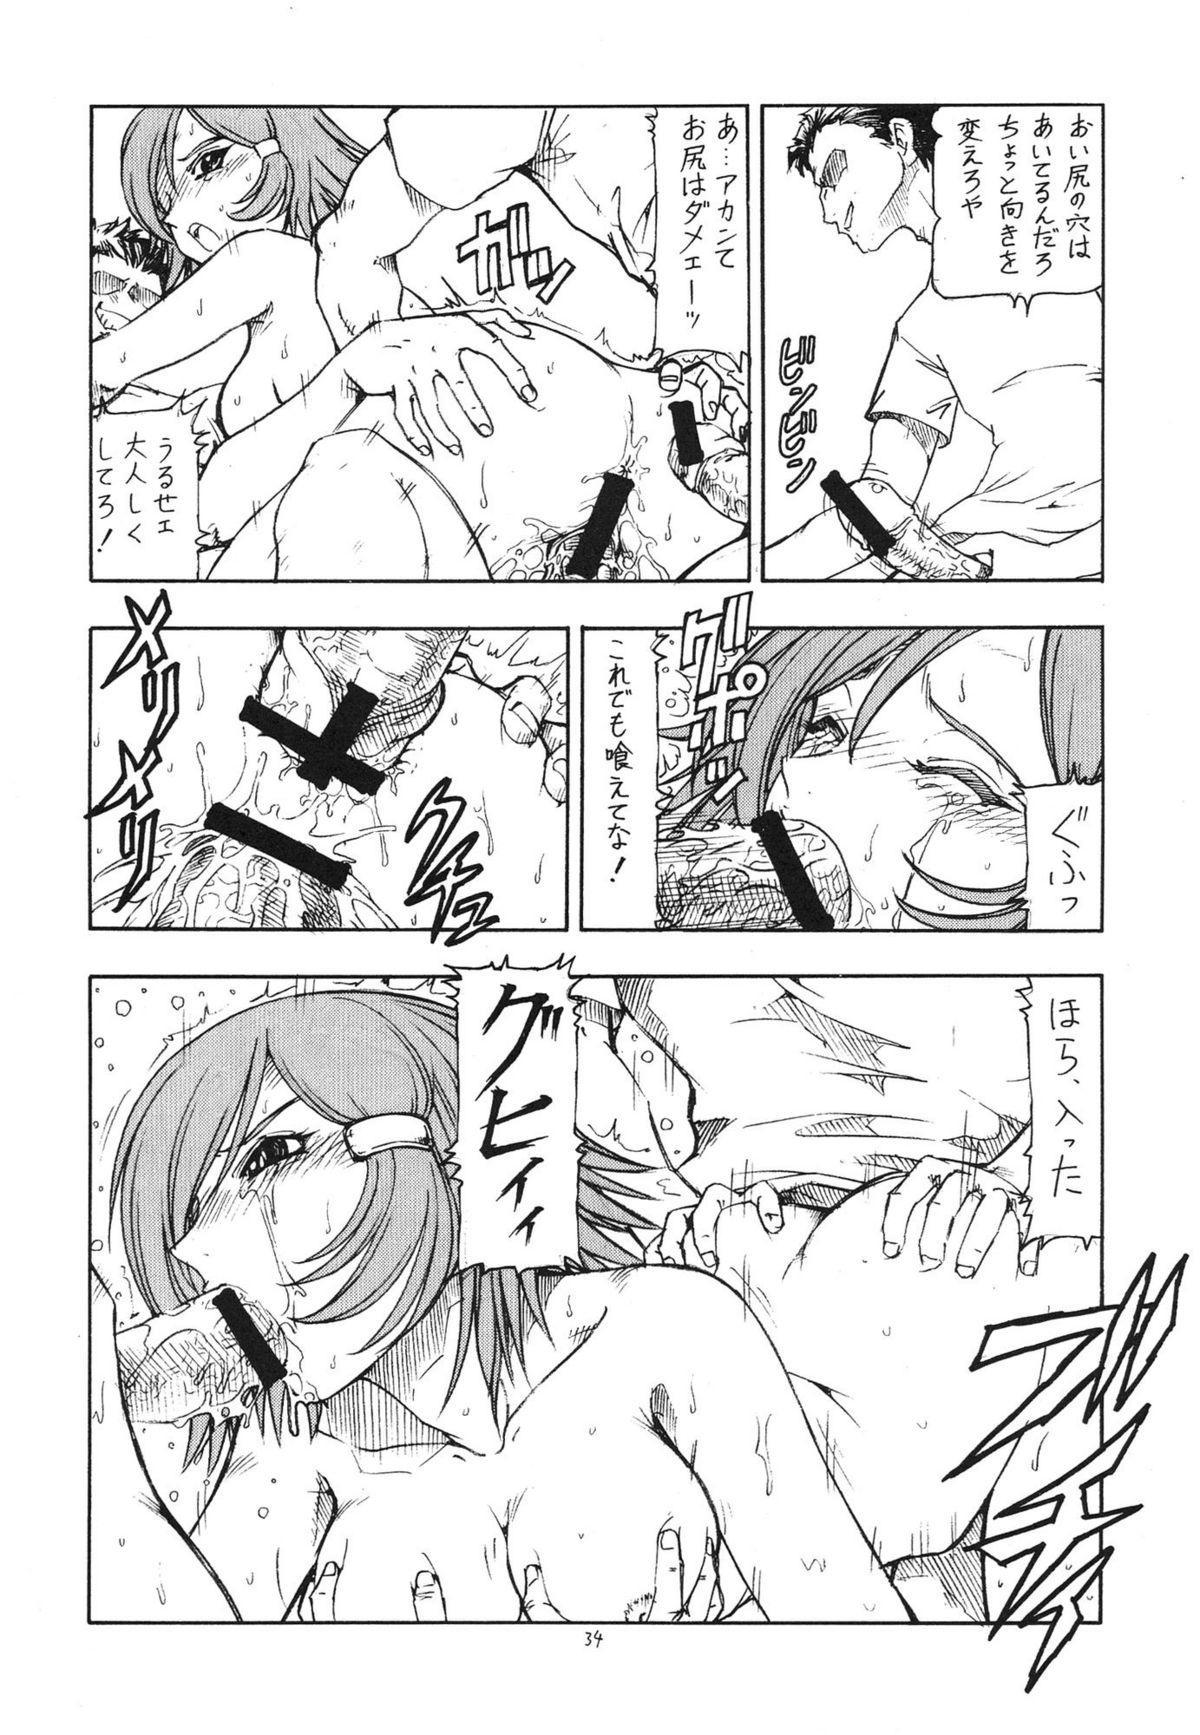 GPM.XXX Animation Moegiiro no Namida - Tear Drops 35